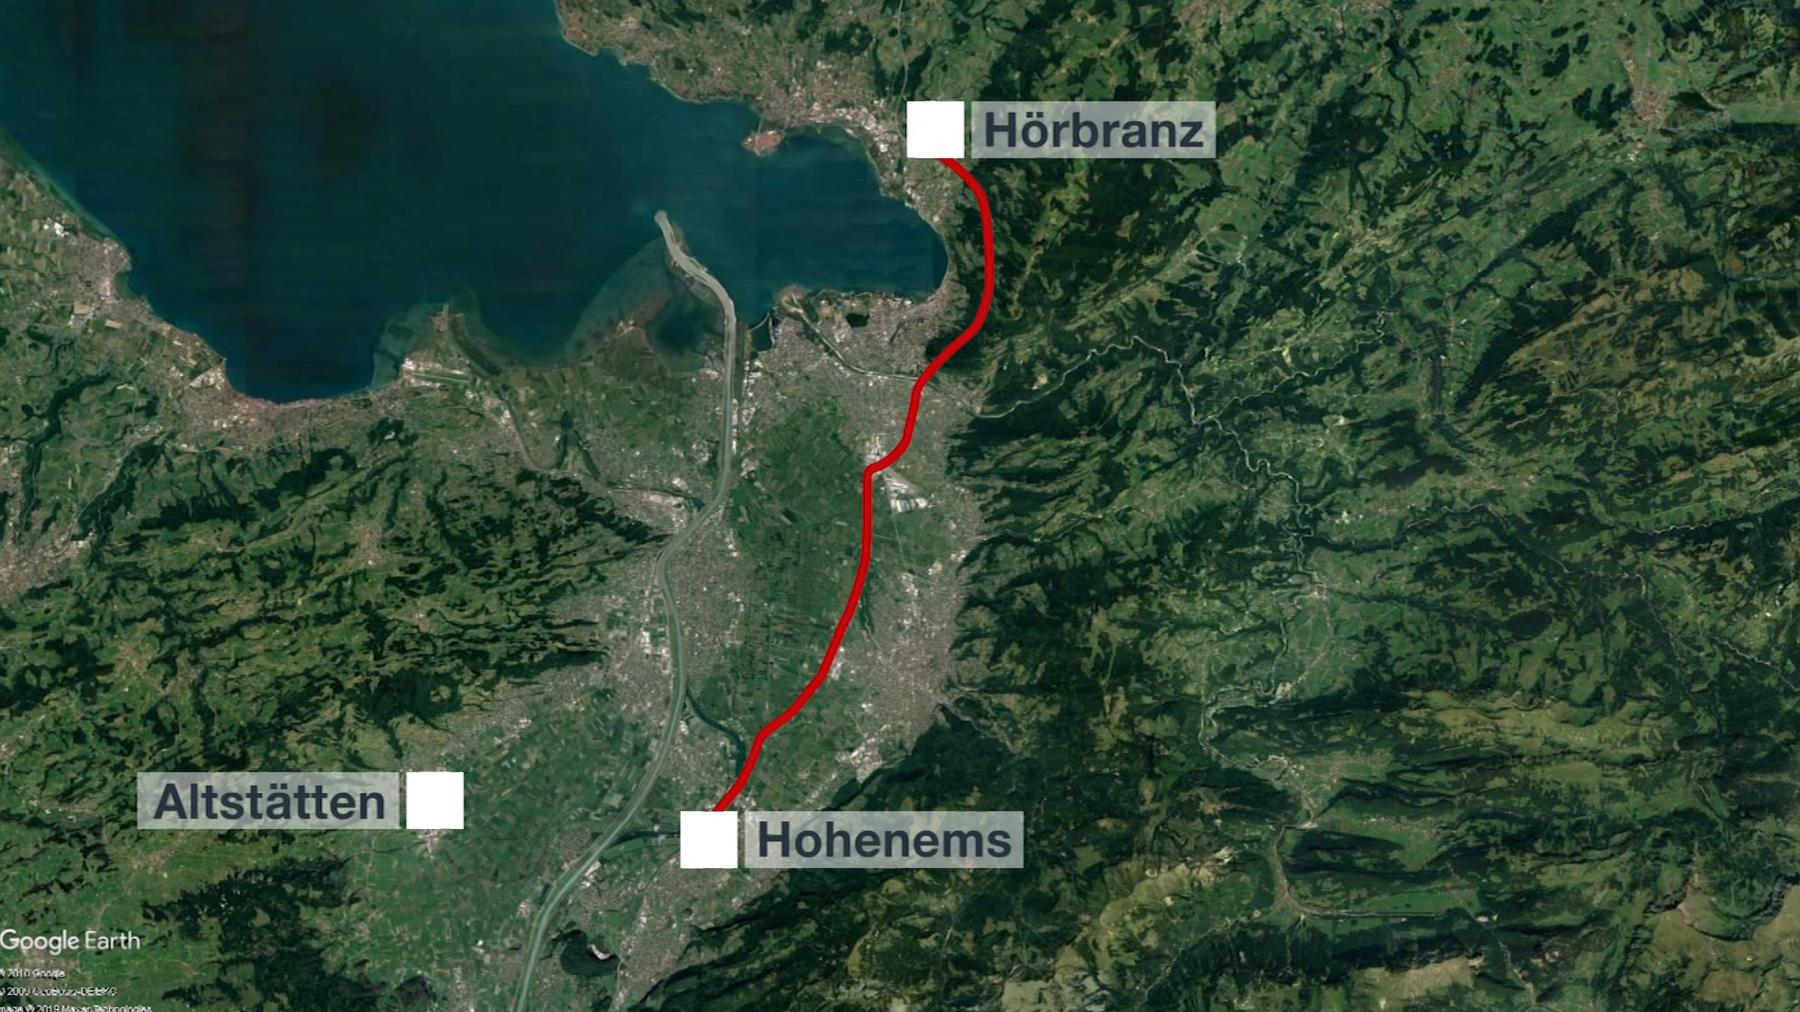 Autobahn Hörbranz-Hohenems Maut Grafik TVO